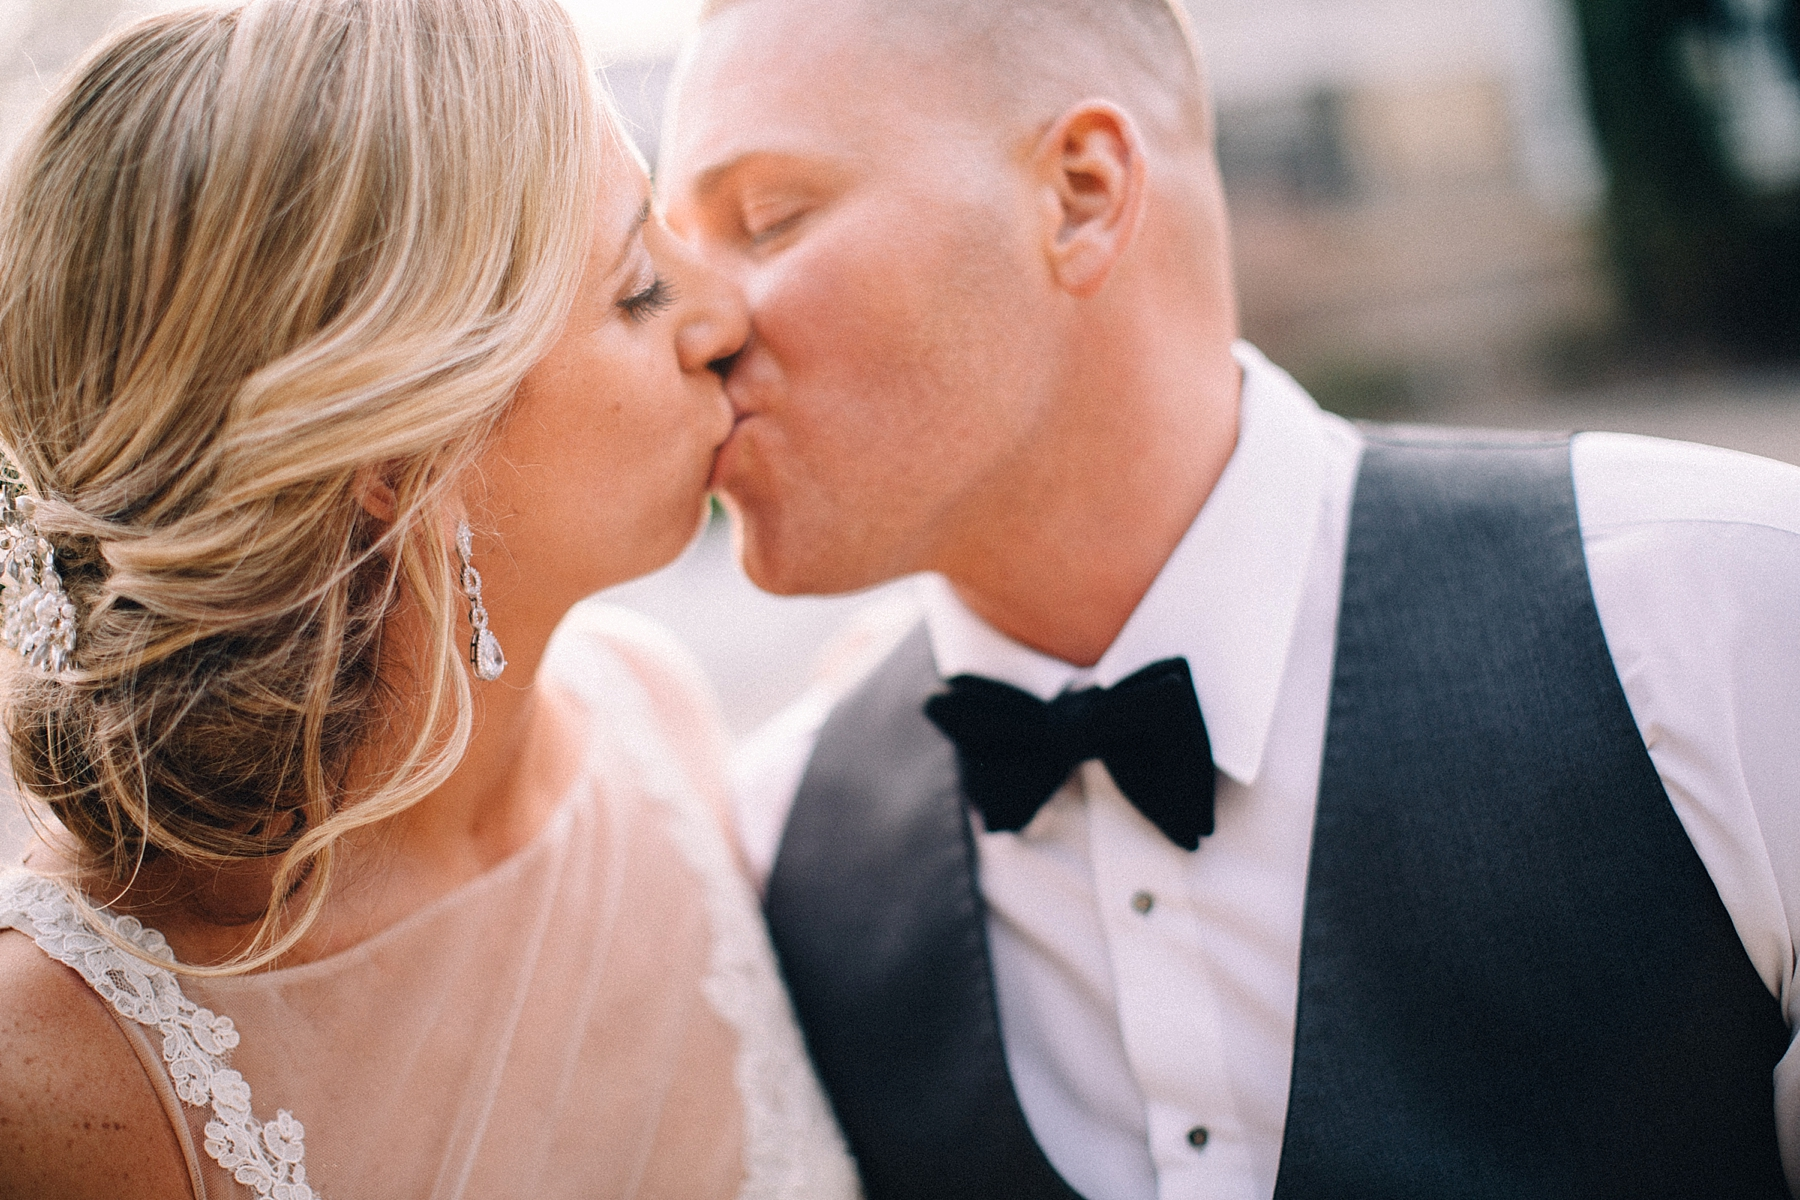 cranford-washington-nj-wedding-photographer-seasons_0026.jpg